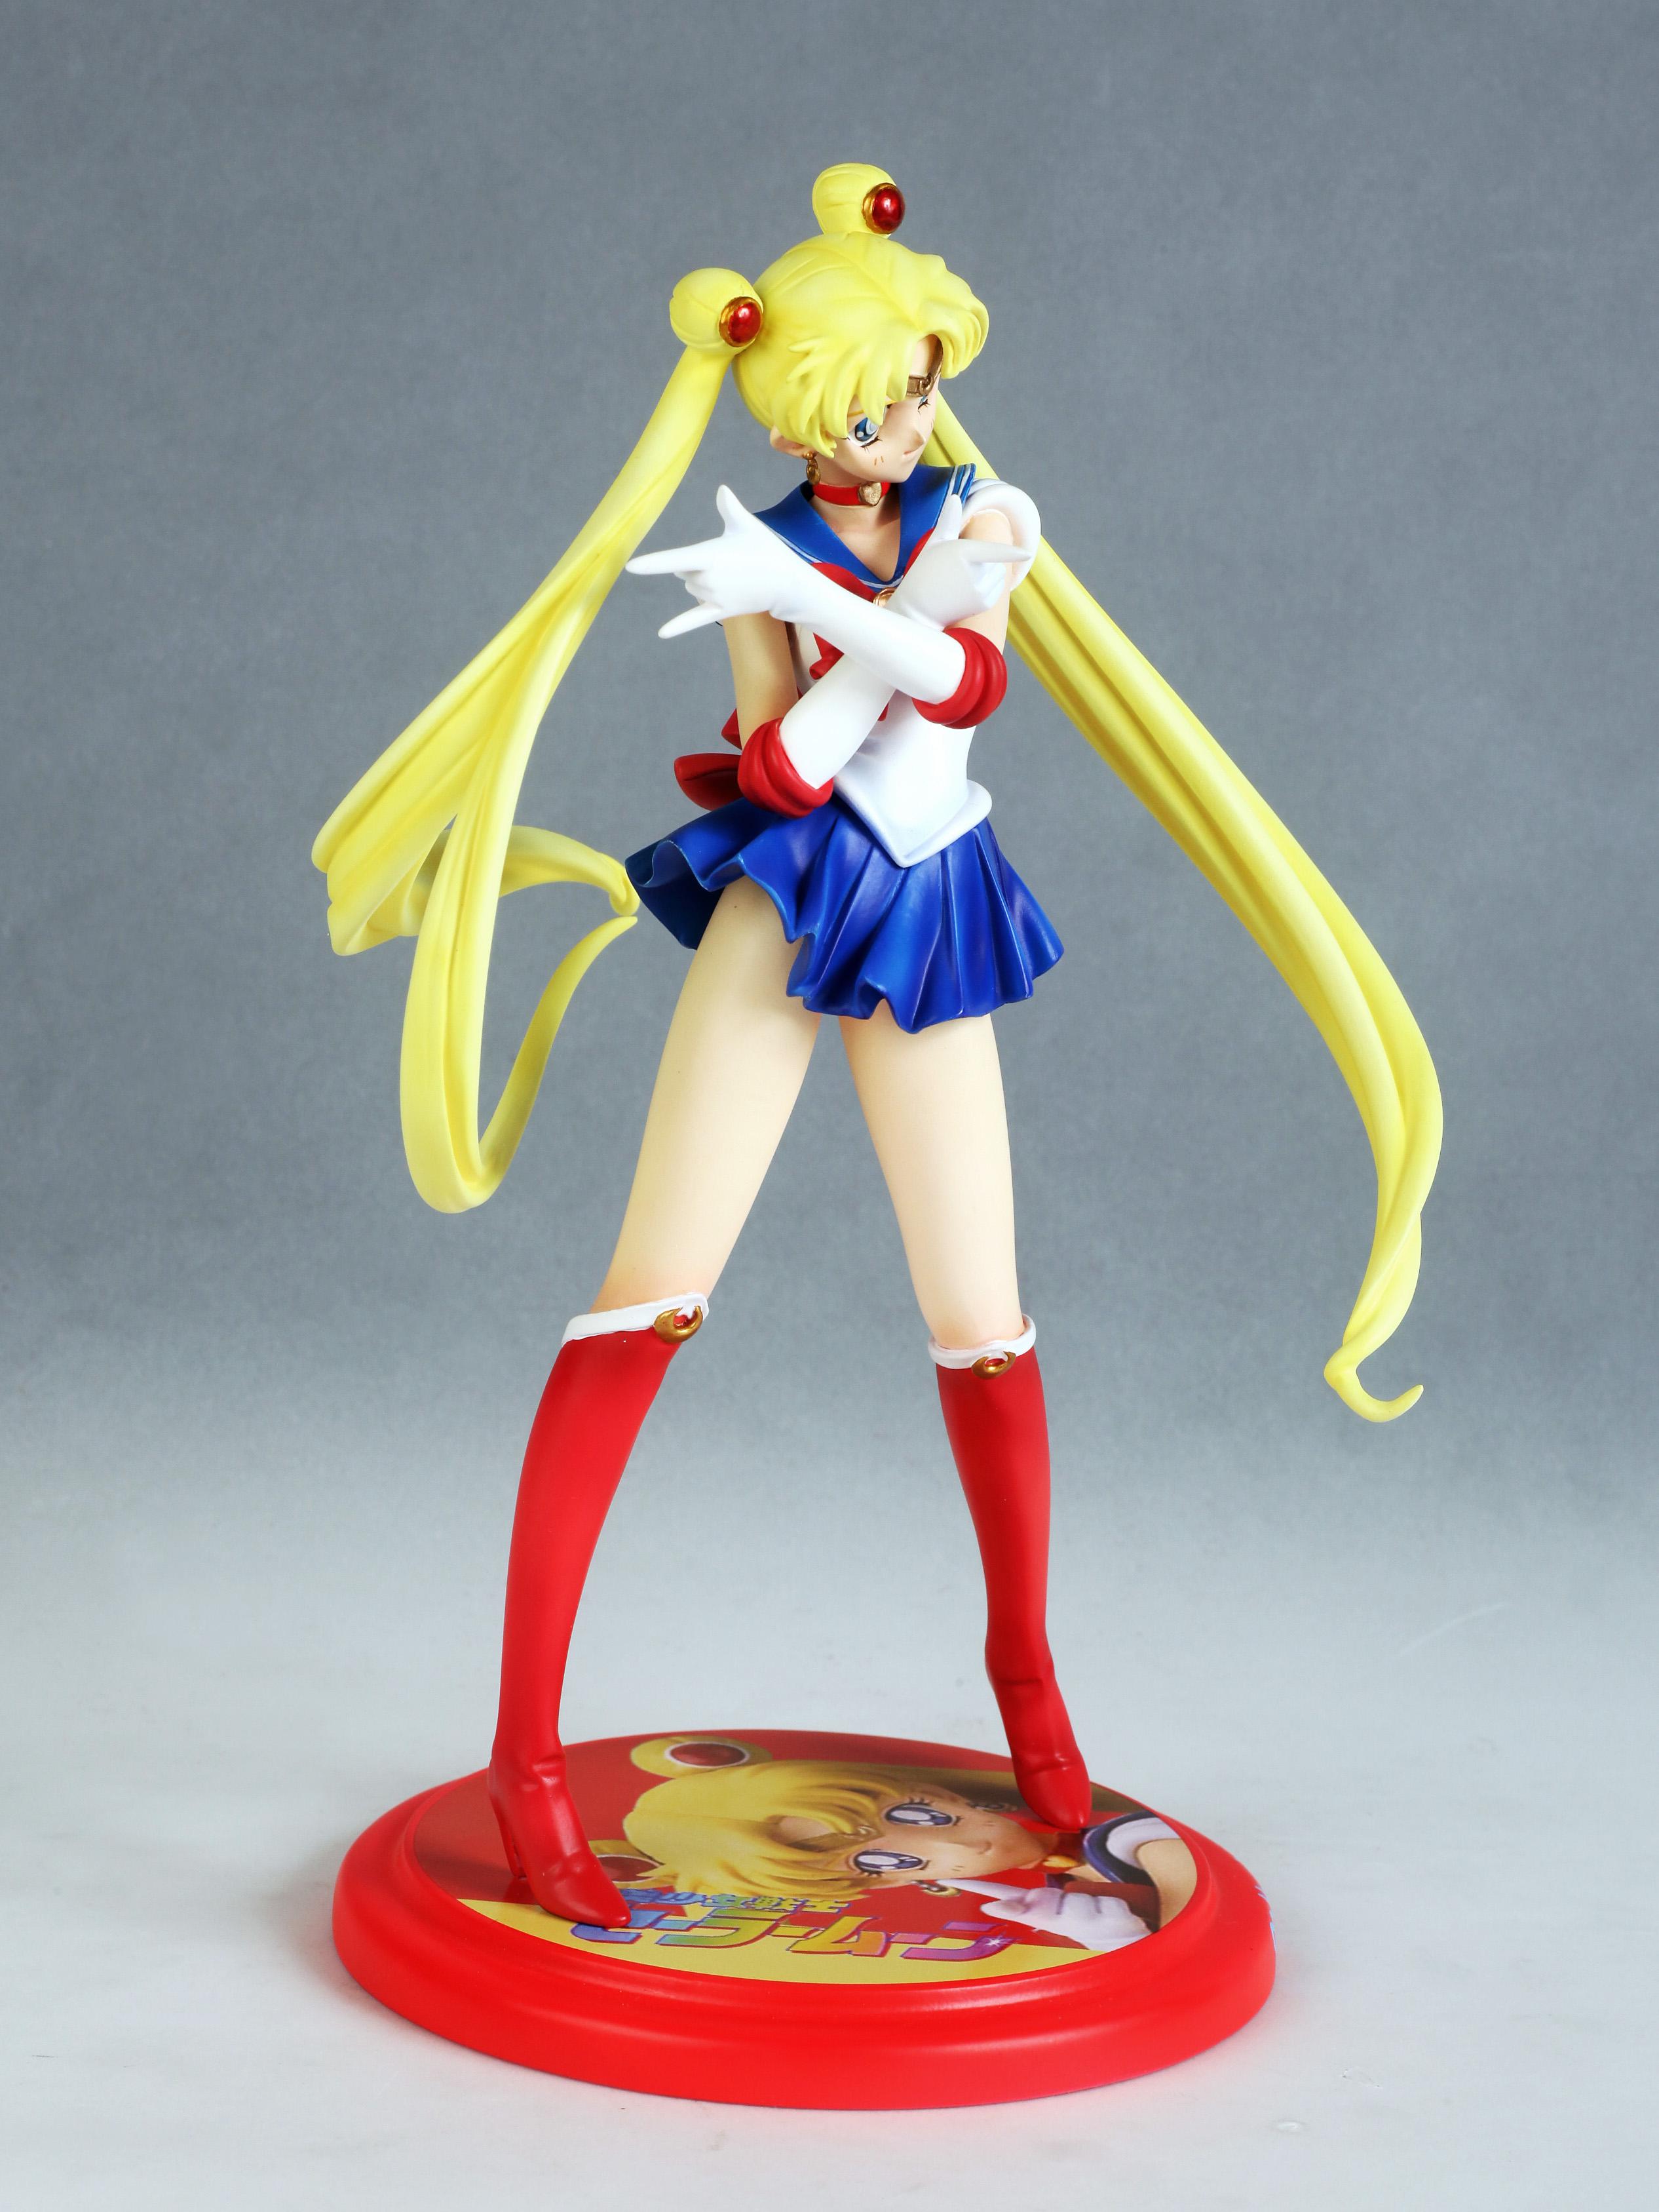 Sailor Moon Usagi Tsukino prepainted figure haruhichan.com Sailor Moon Anime figure 03